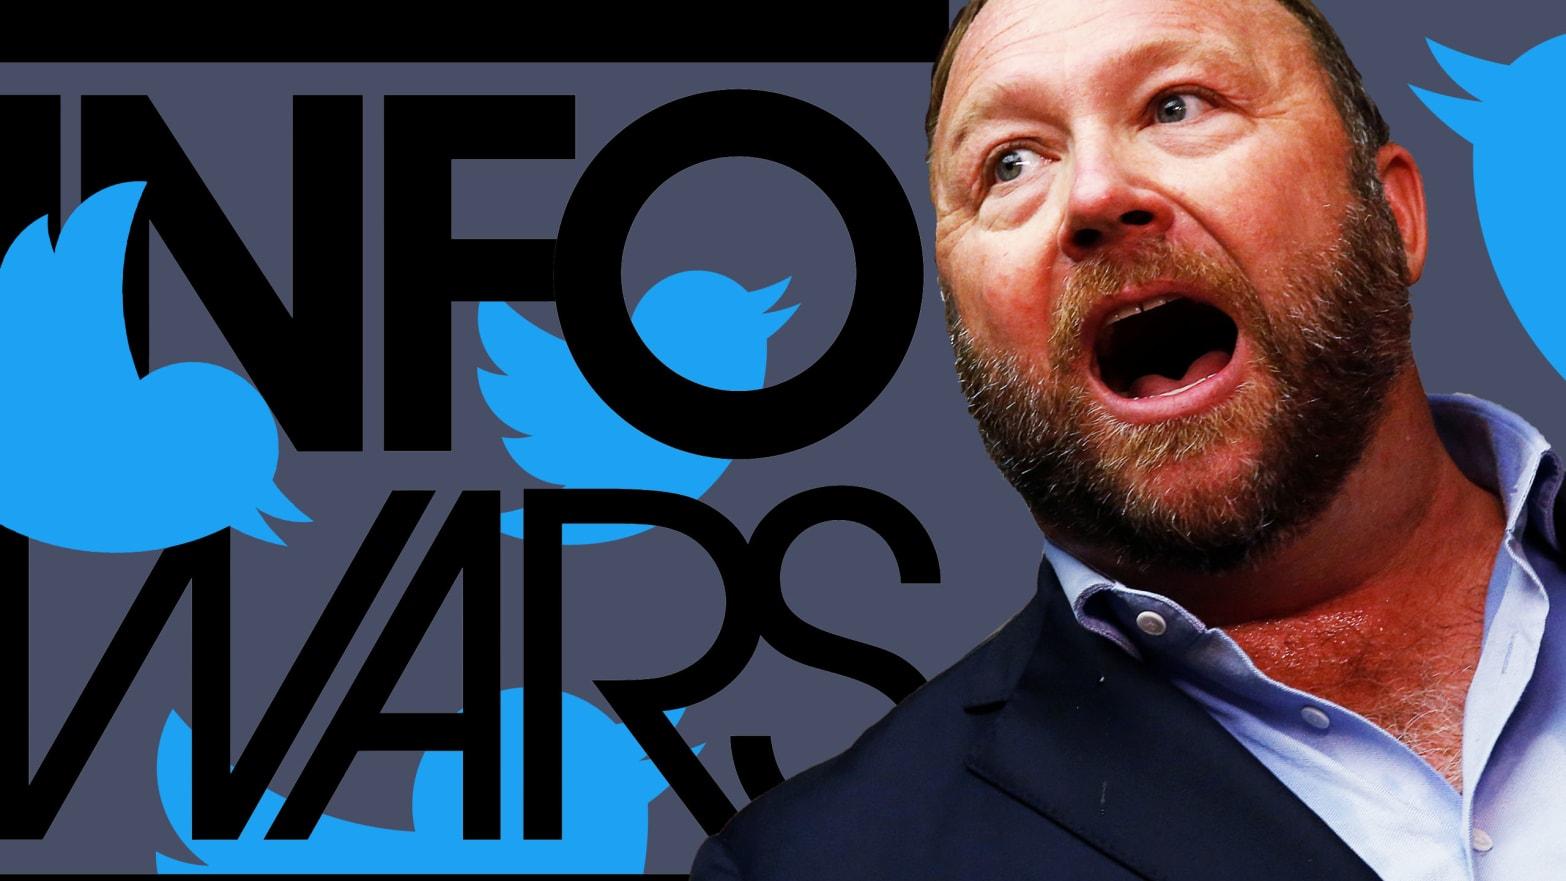 Alex Jones and InfoWars Are Still on Twitter, Despite 'Ban'